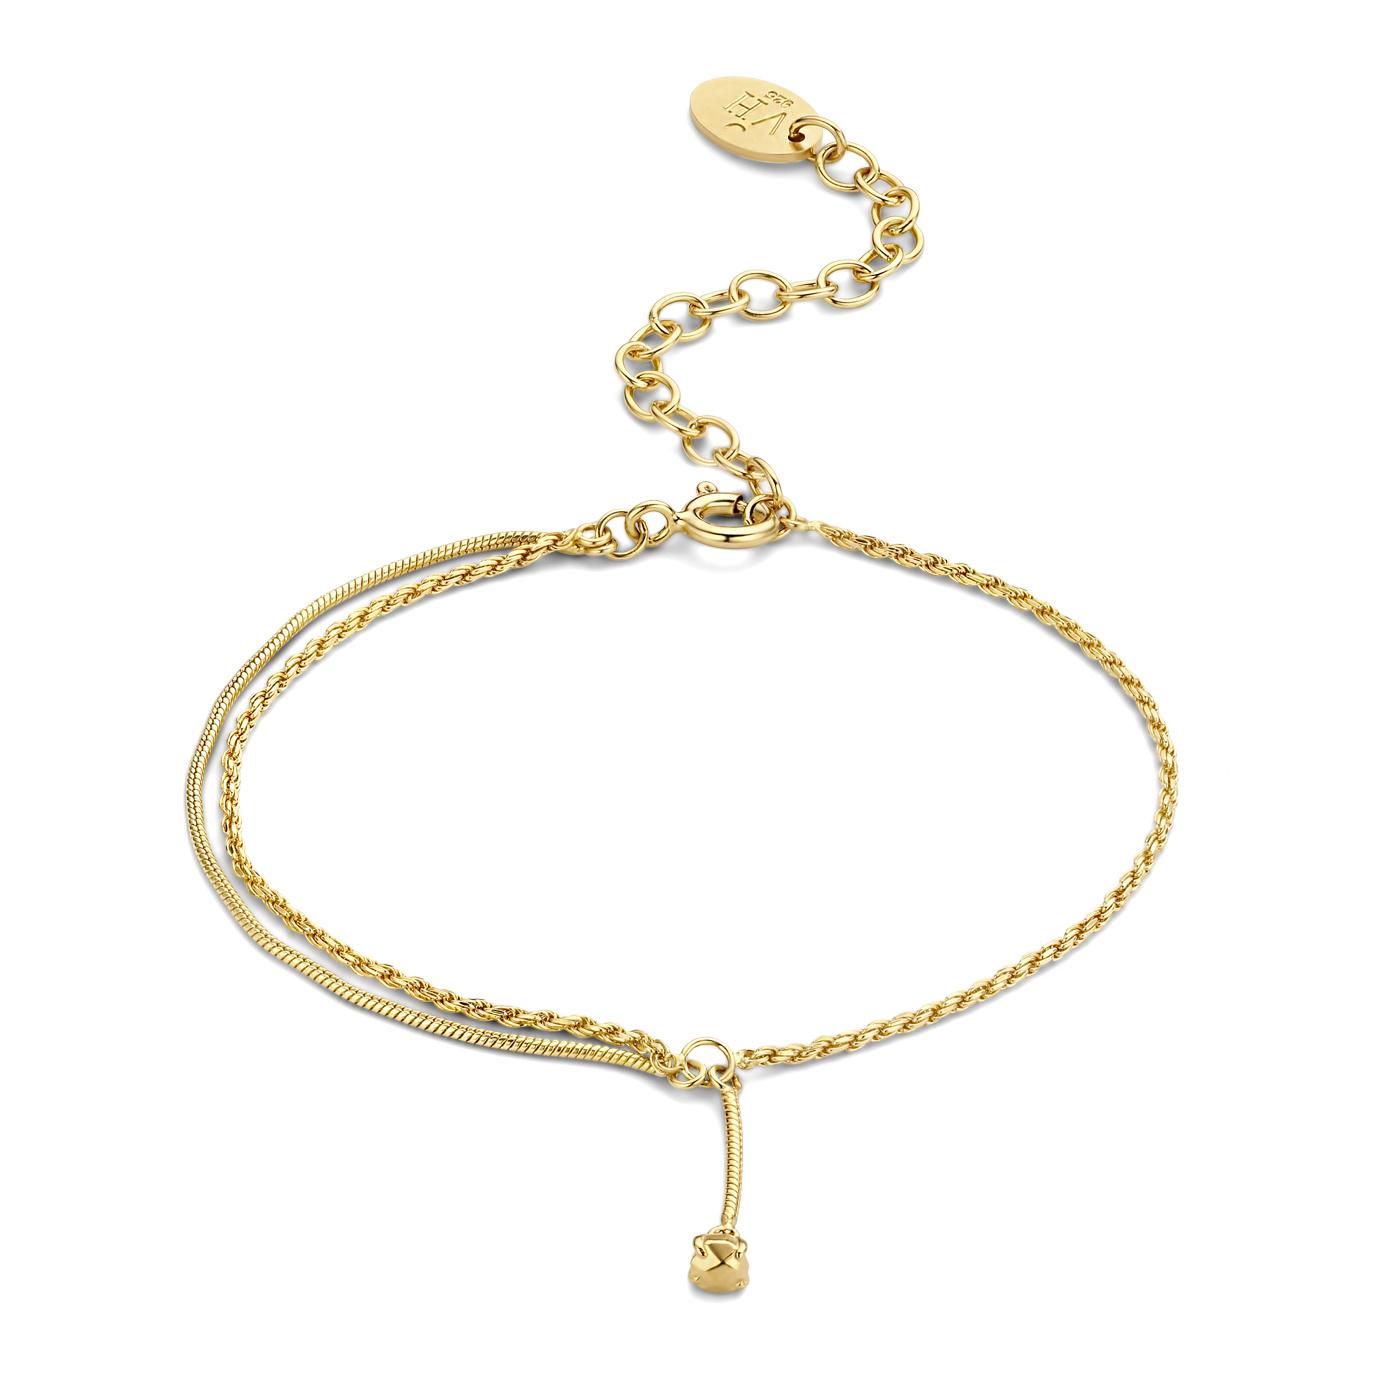 Violet Hamden Sisterhood Lunisolar 925 sterling zilver goudkleurige armband gedraaid met steentje